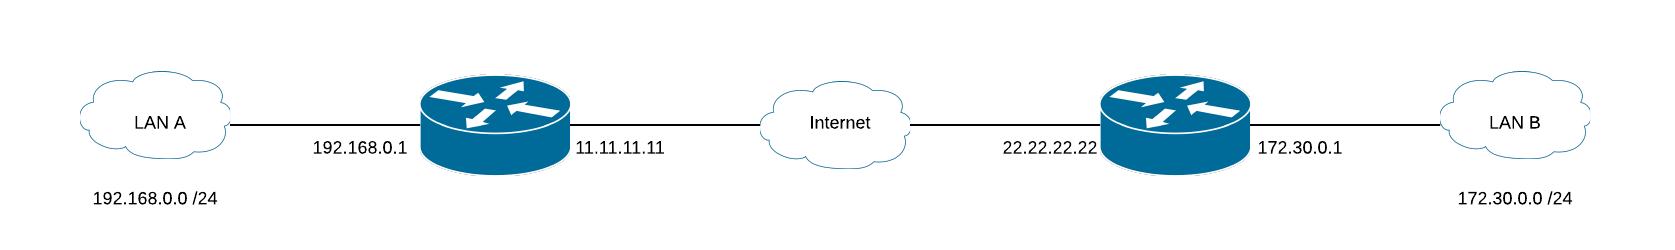 Mikrotik IPsec VPN   IPNET